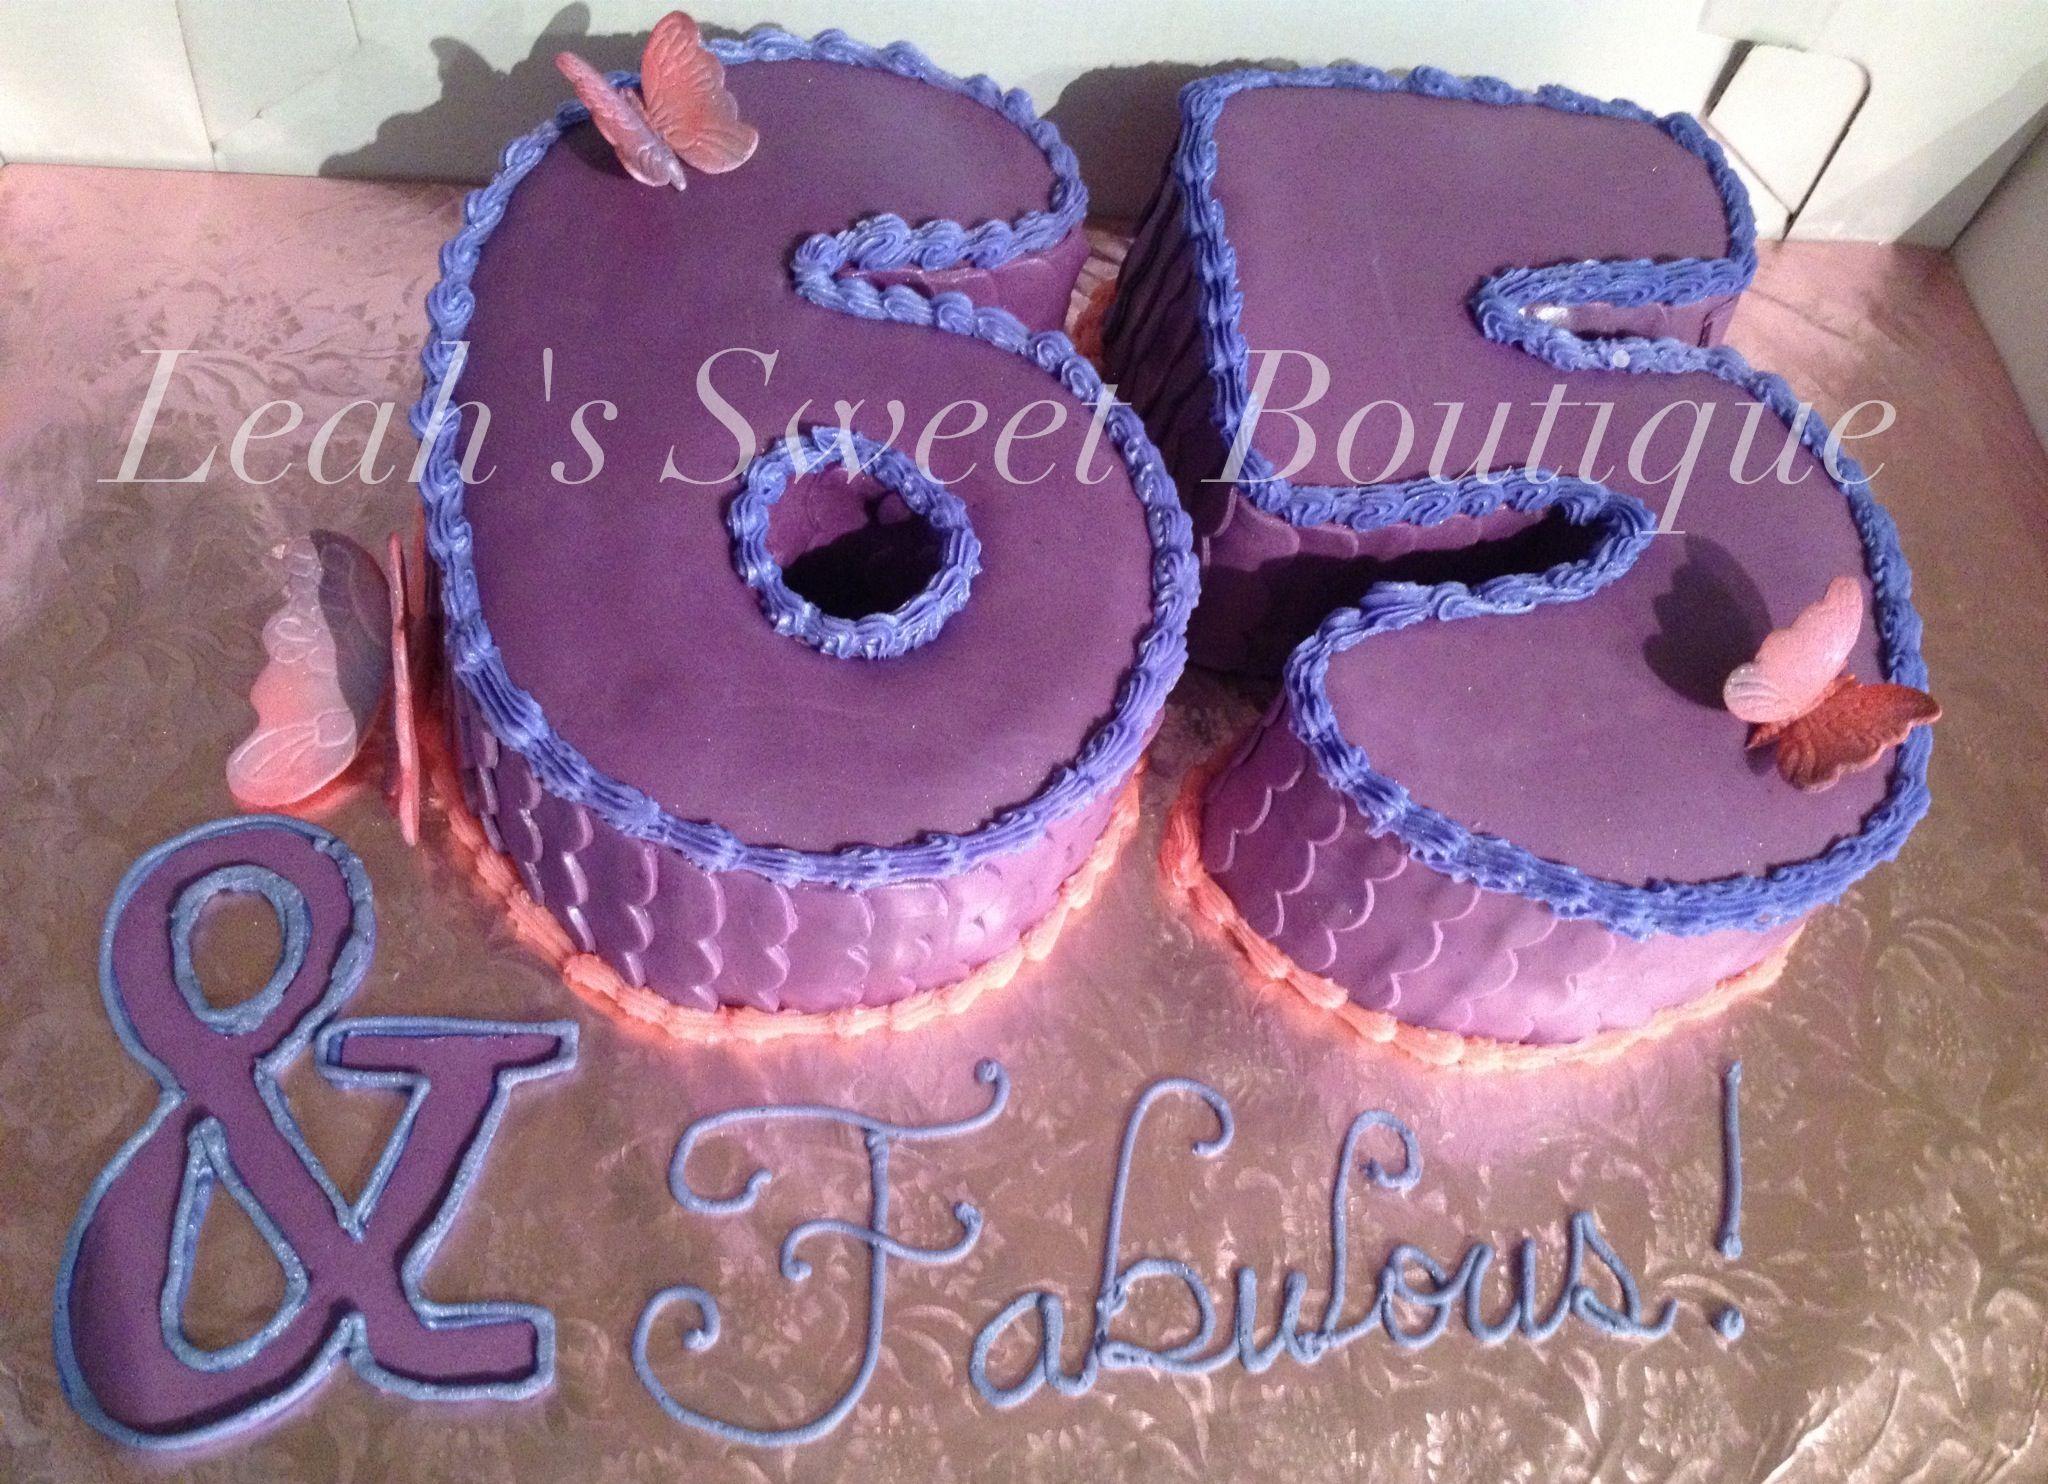 65th birthday cake 65 birthday ideas pinterest for 65th birthday party decoration ideas